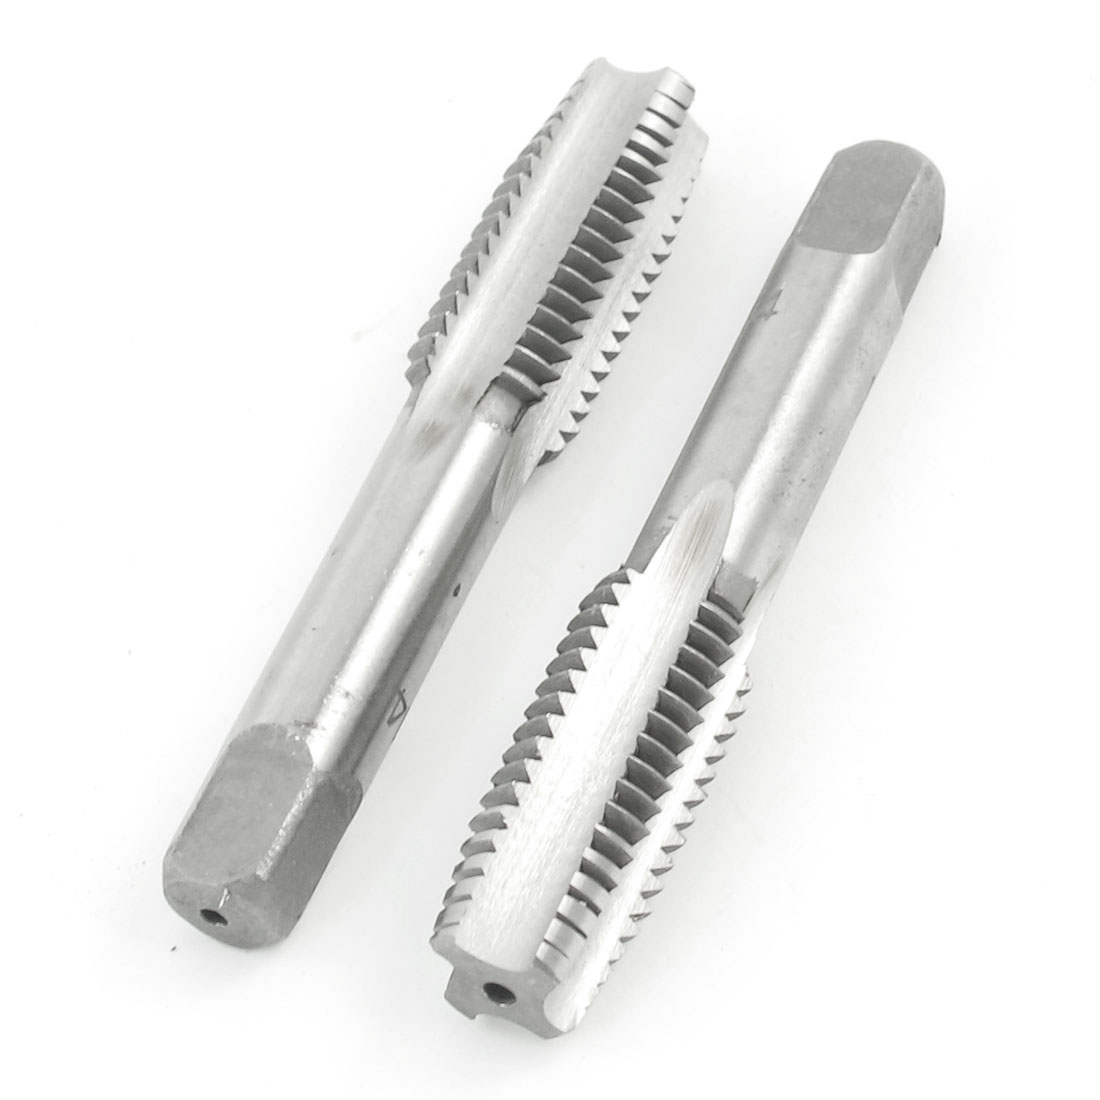 2 Pcs Straight M14 Dia. Screw Type Flute Bottom Plug Tap Bits